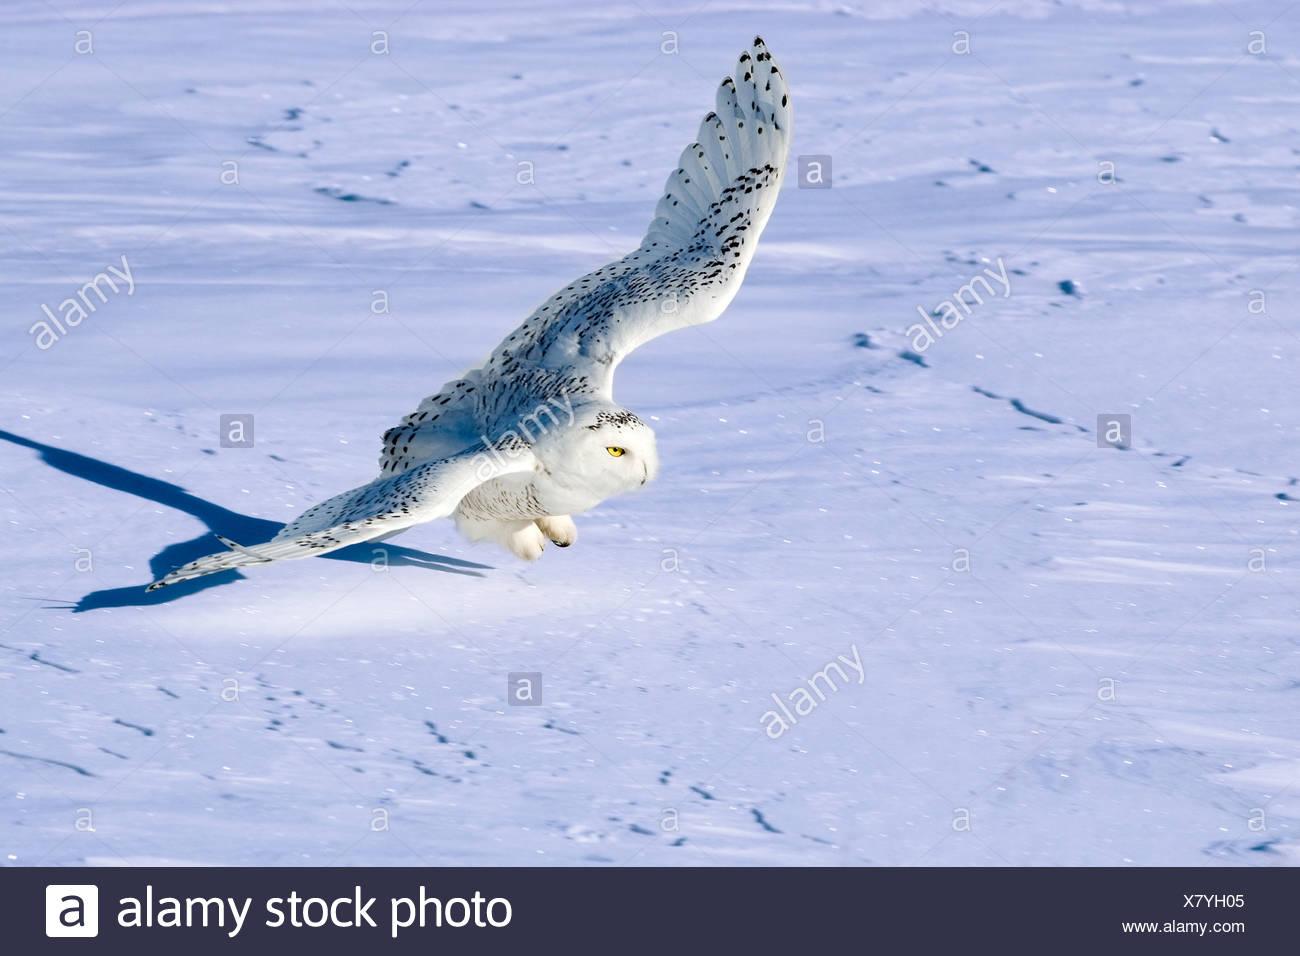 Schnee-Eule (Bubo Scandiaca) Jagd im Winter, Prairie, Alberta, Kanada Stockbild